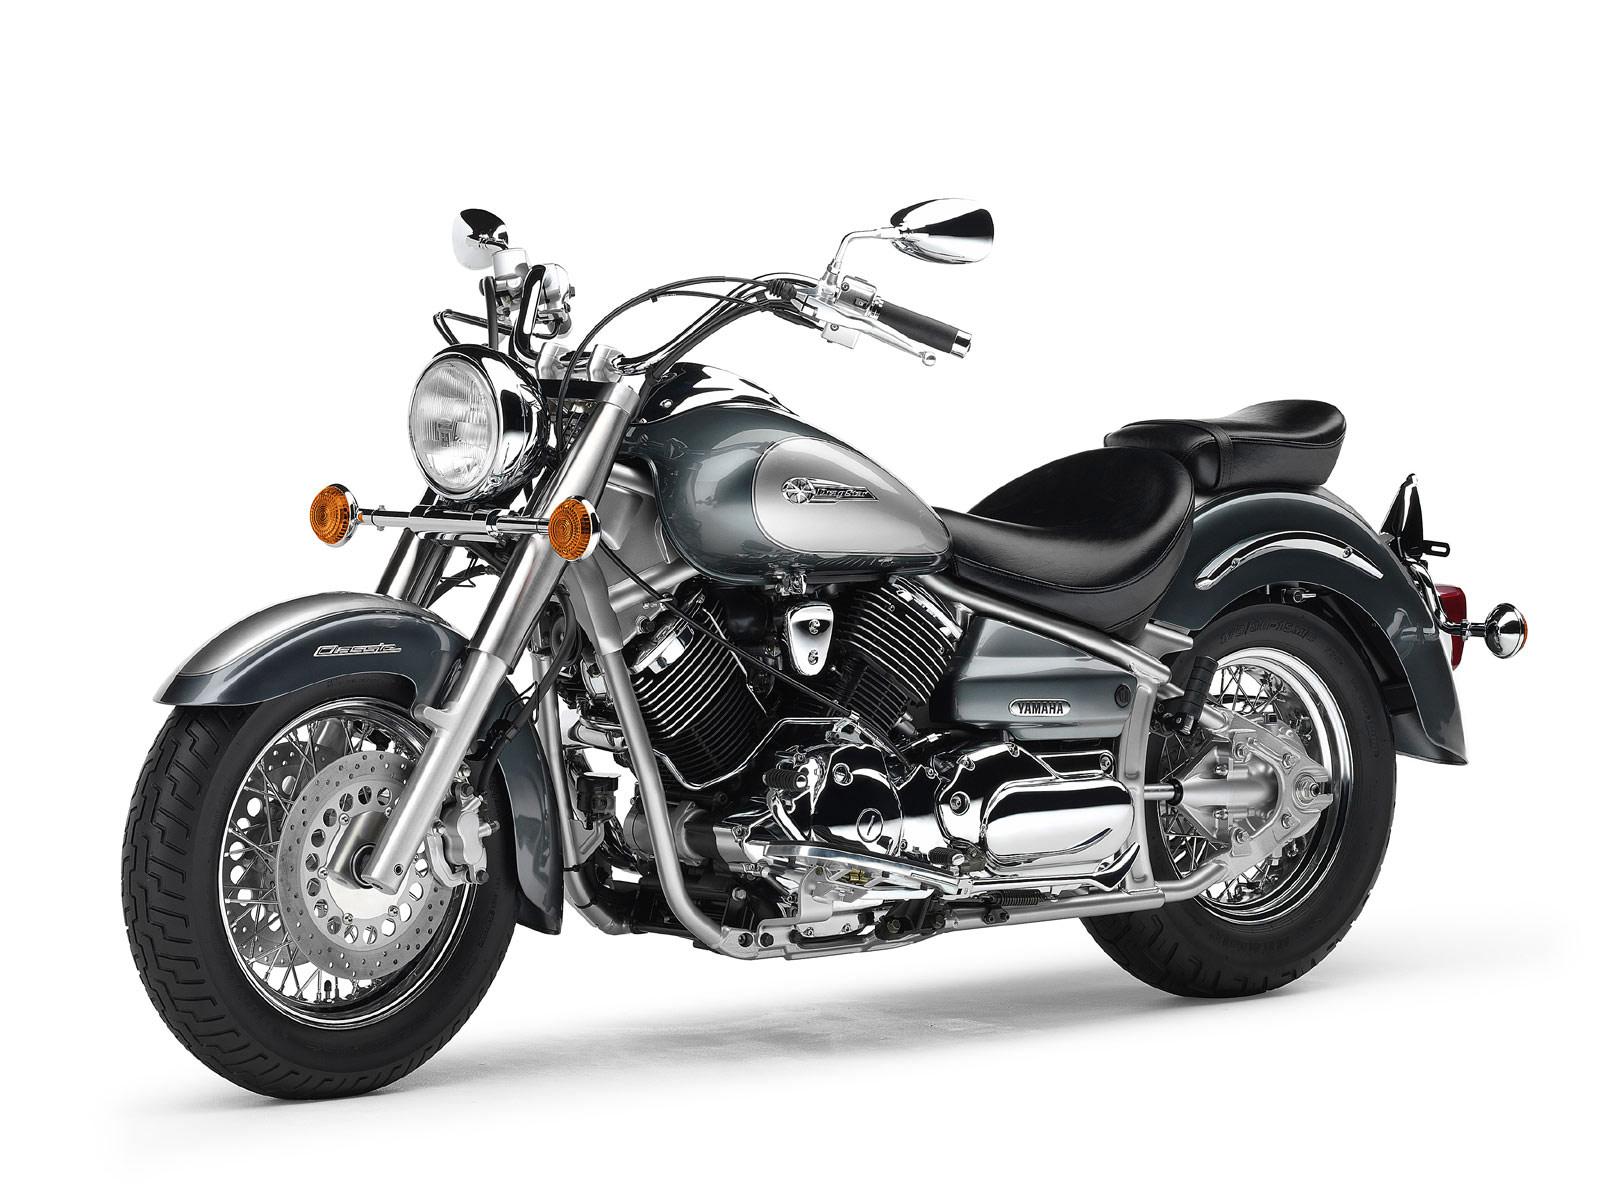 2007 yamaha xvs 1100 a dragstar classic motorcycle. Black Bedroom Furniture Sets. Home Design Ideas